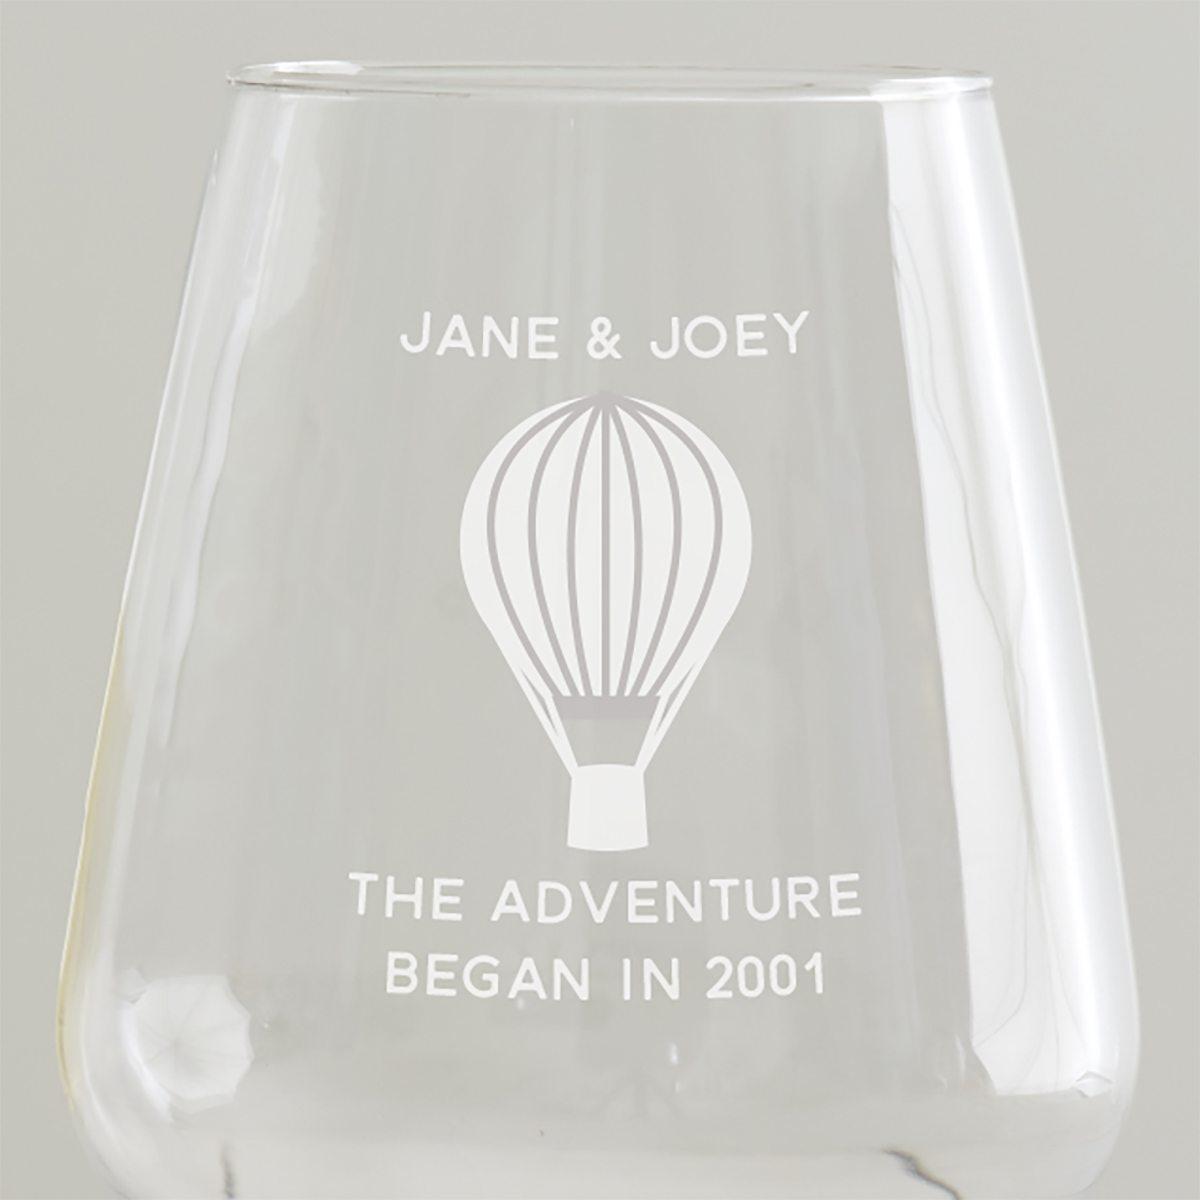 Personalised 'Adventure' Anniversary Wine Glass Set